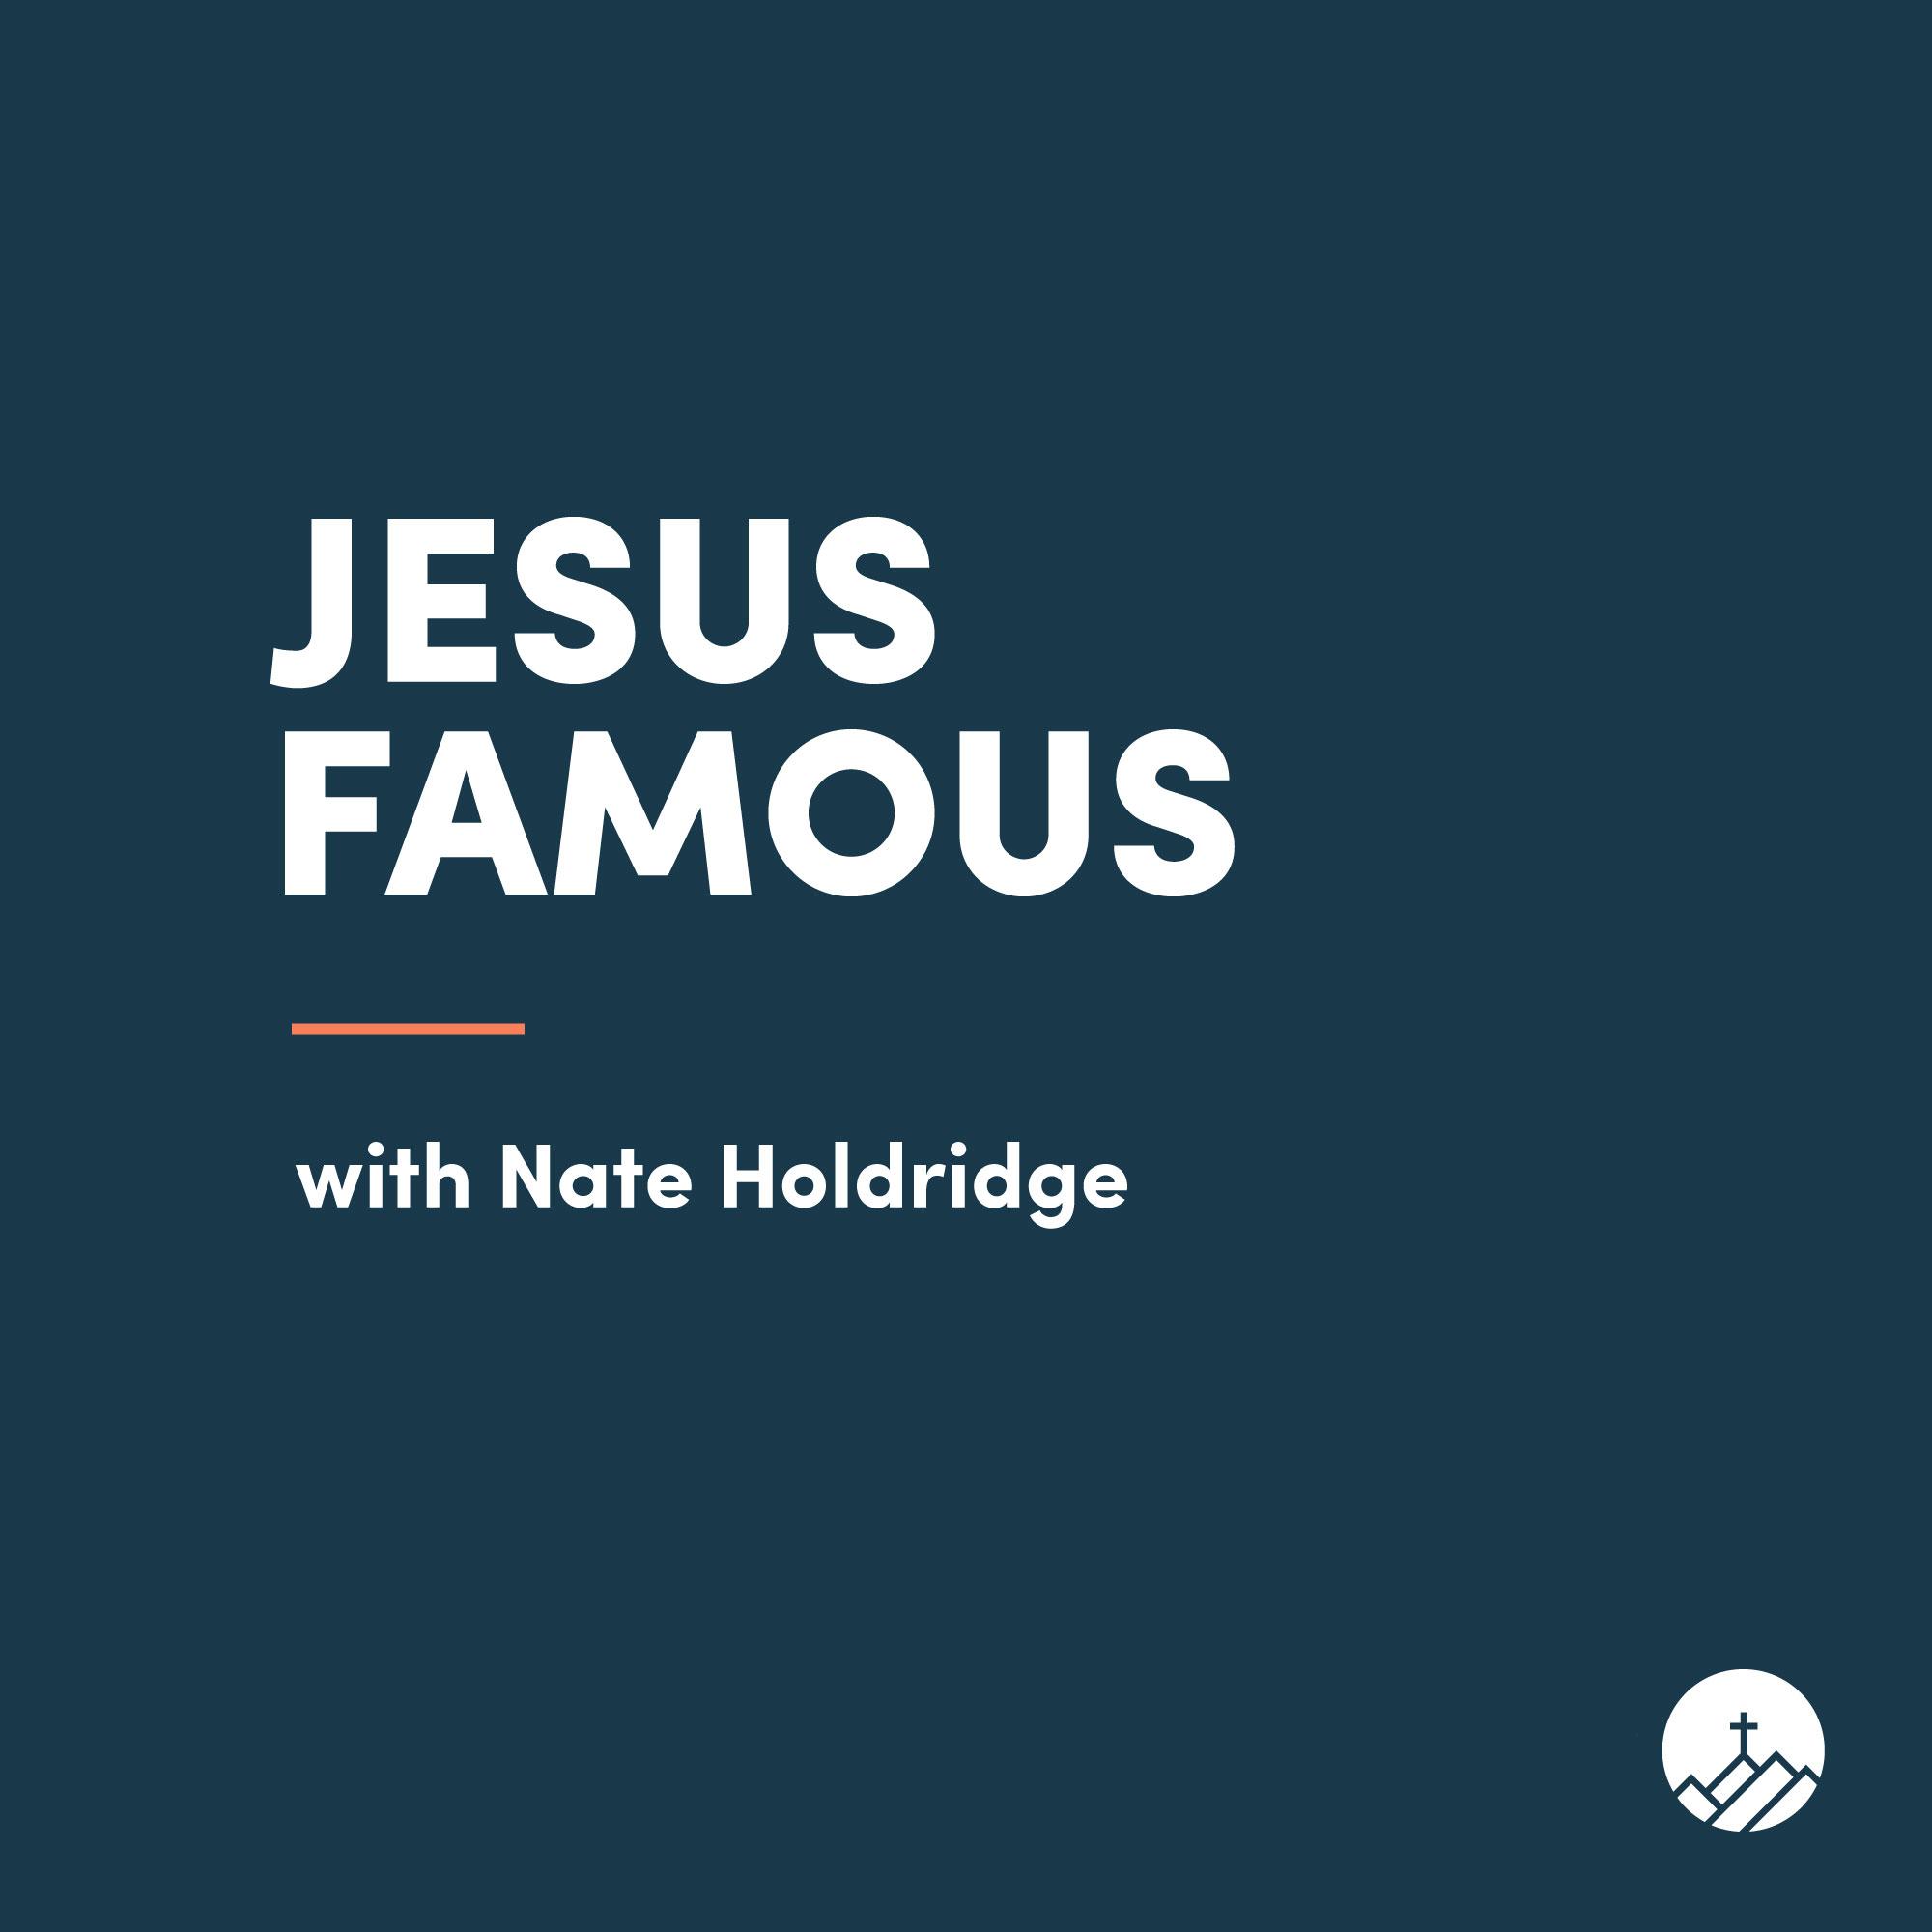 Jesus-Fampus-Podcast---Logo-3.jpg